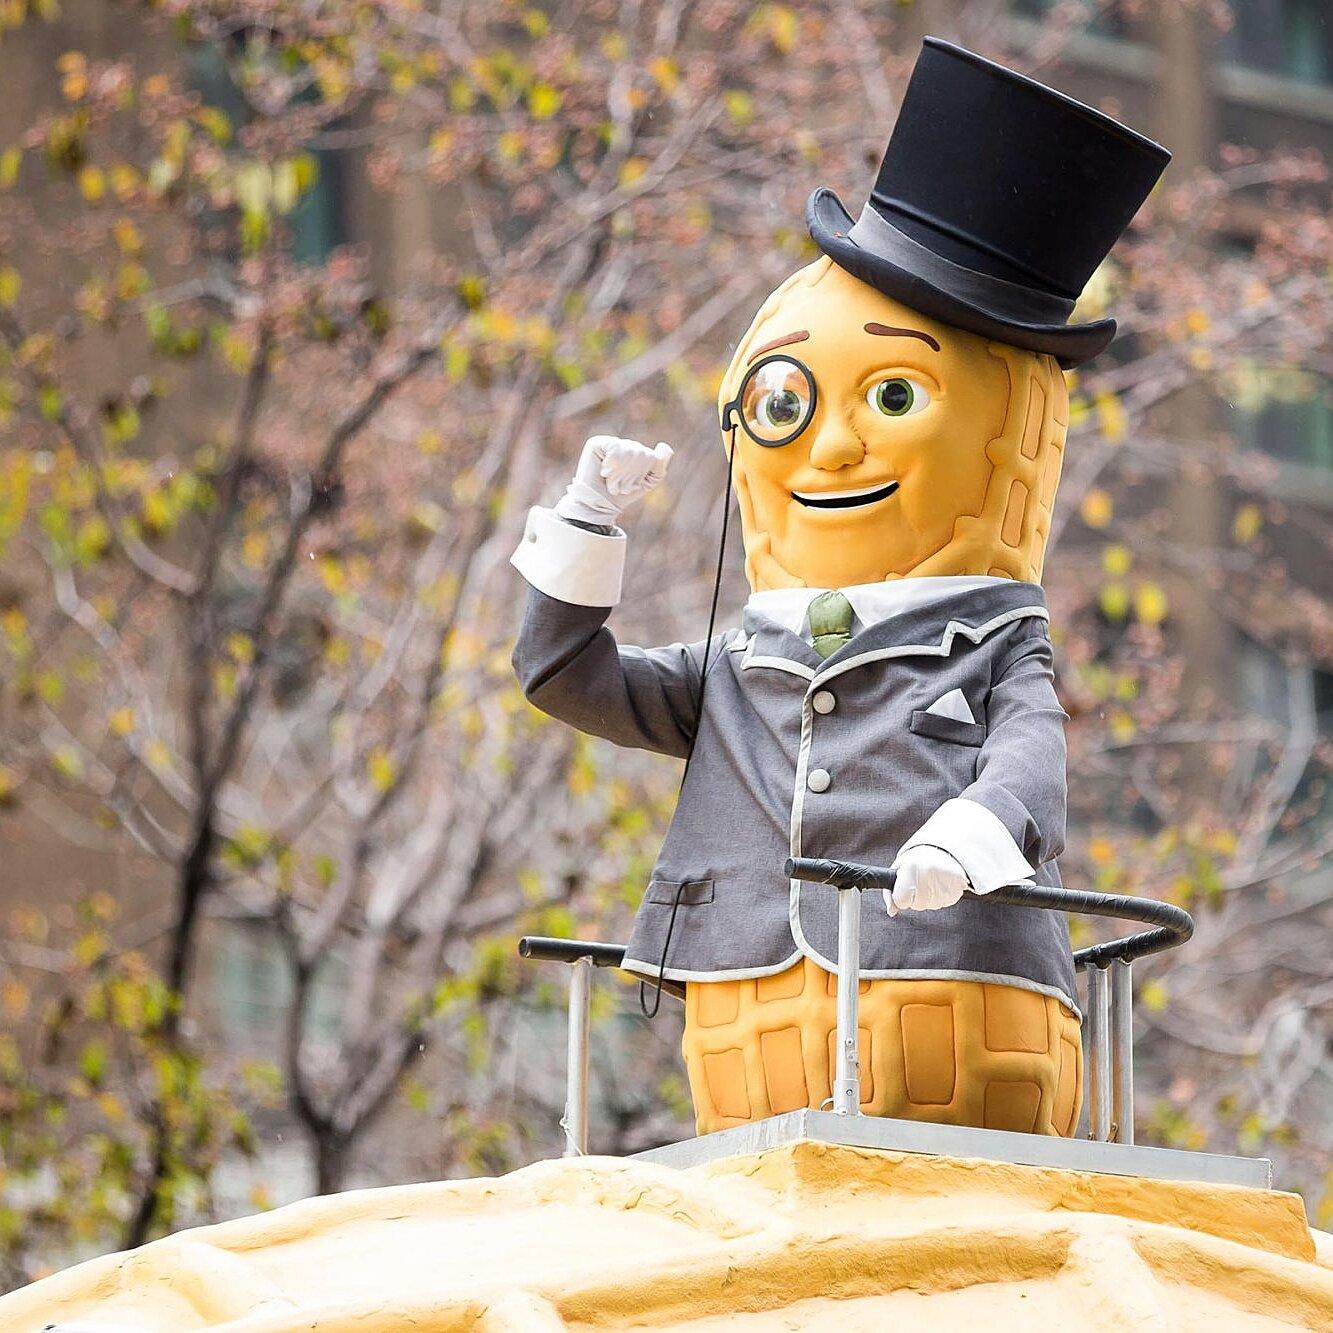 Roblox Got Talent Death Run Roblox Image Generator - Mr Peanut Dead Planters Mascot Dies At 104 In Pre Super Bowl